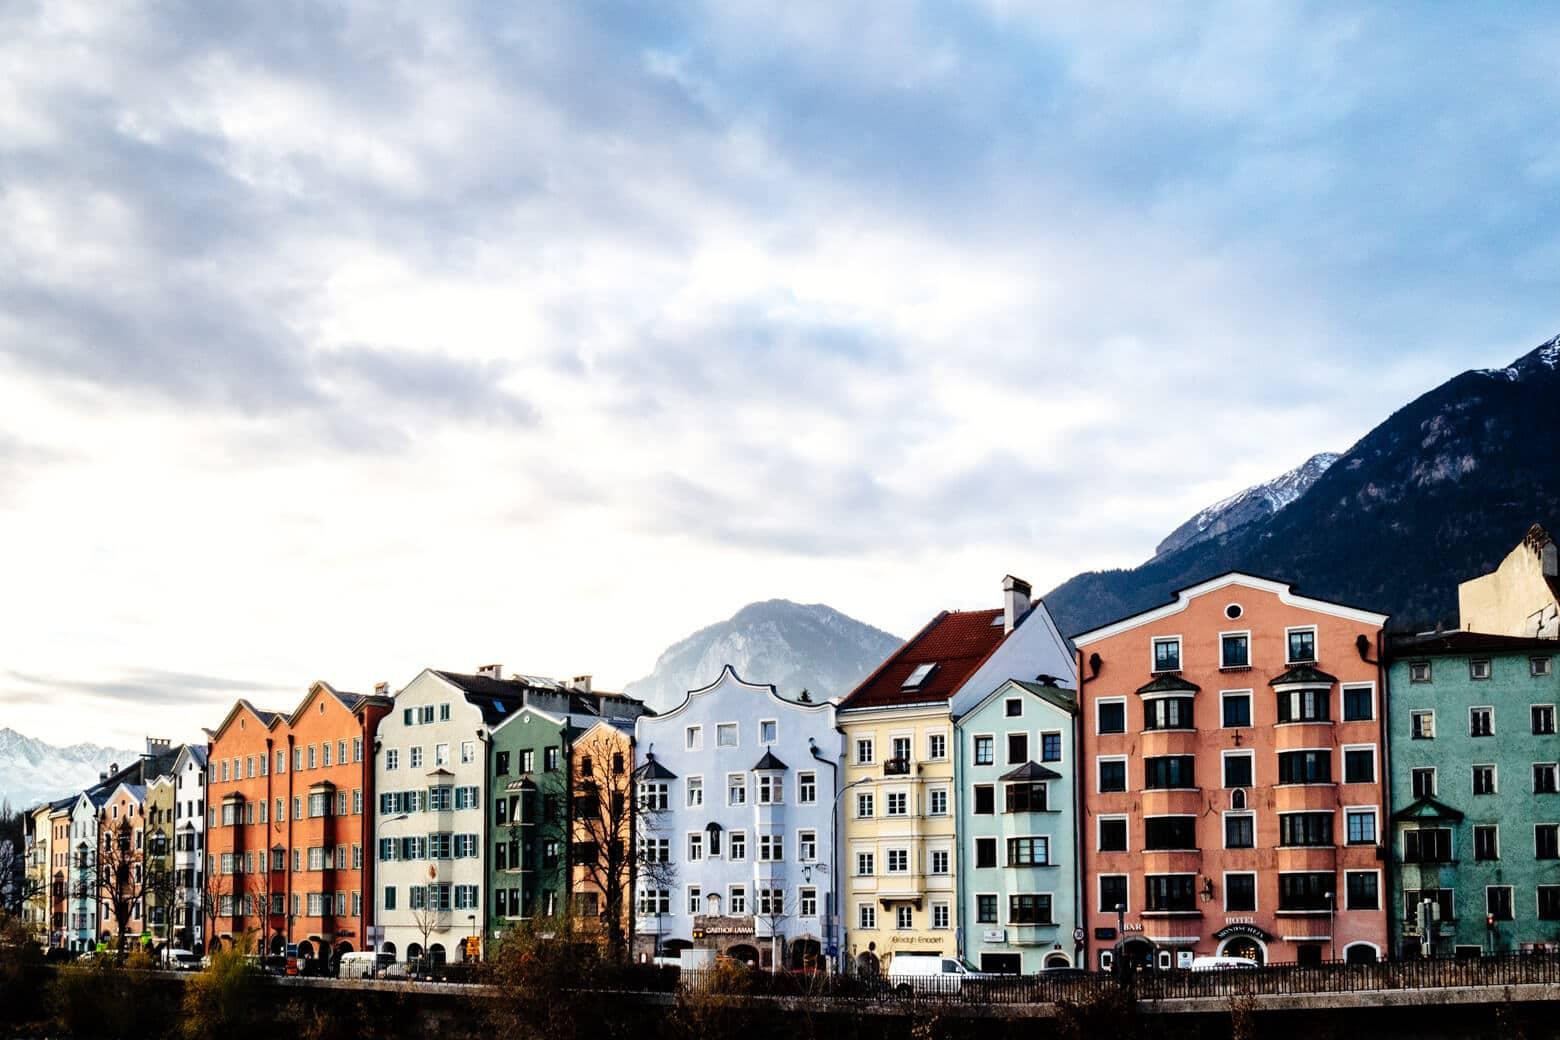 Innsbruck in December